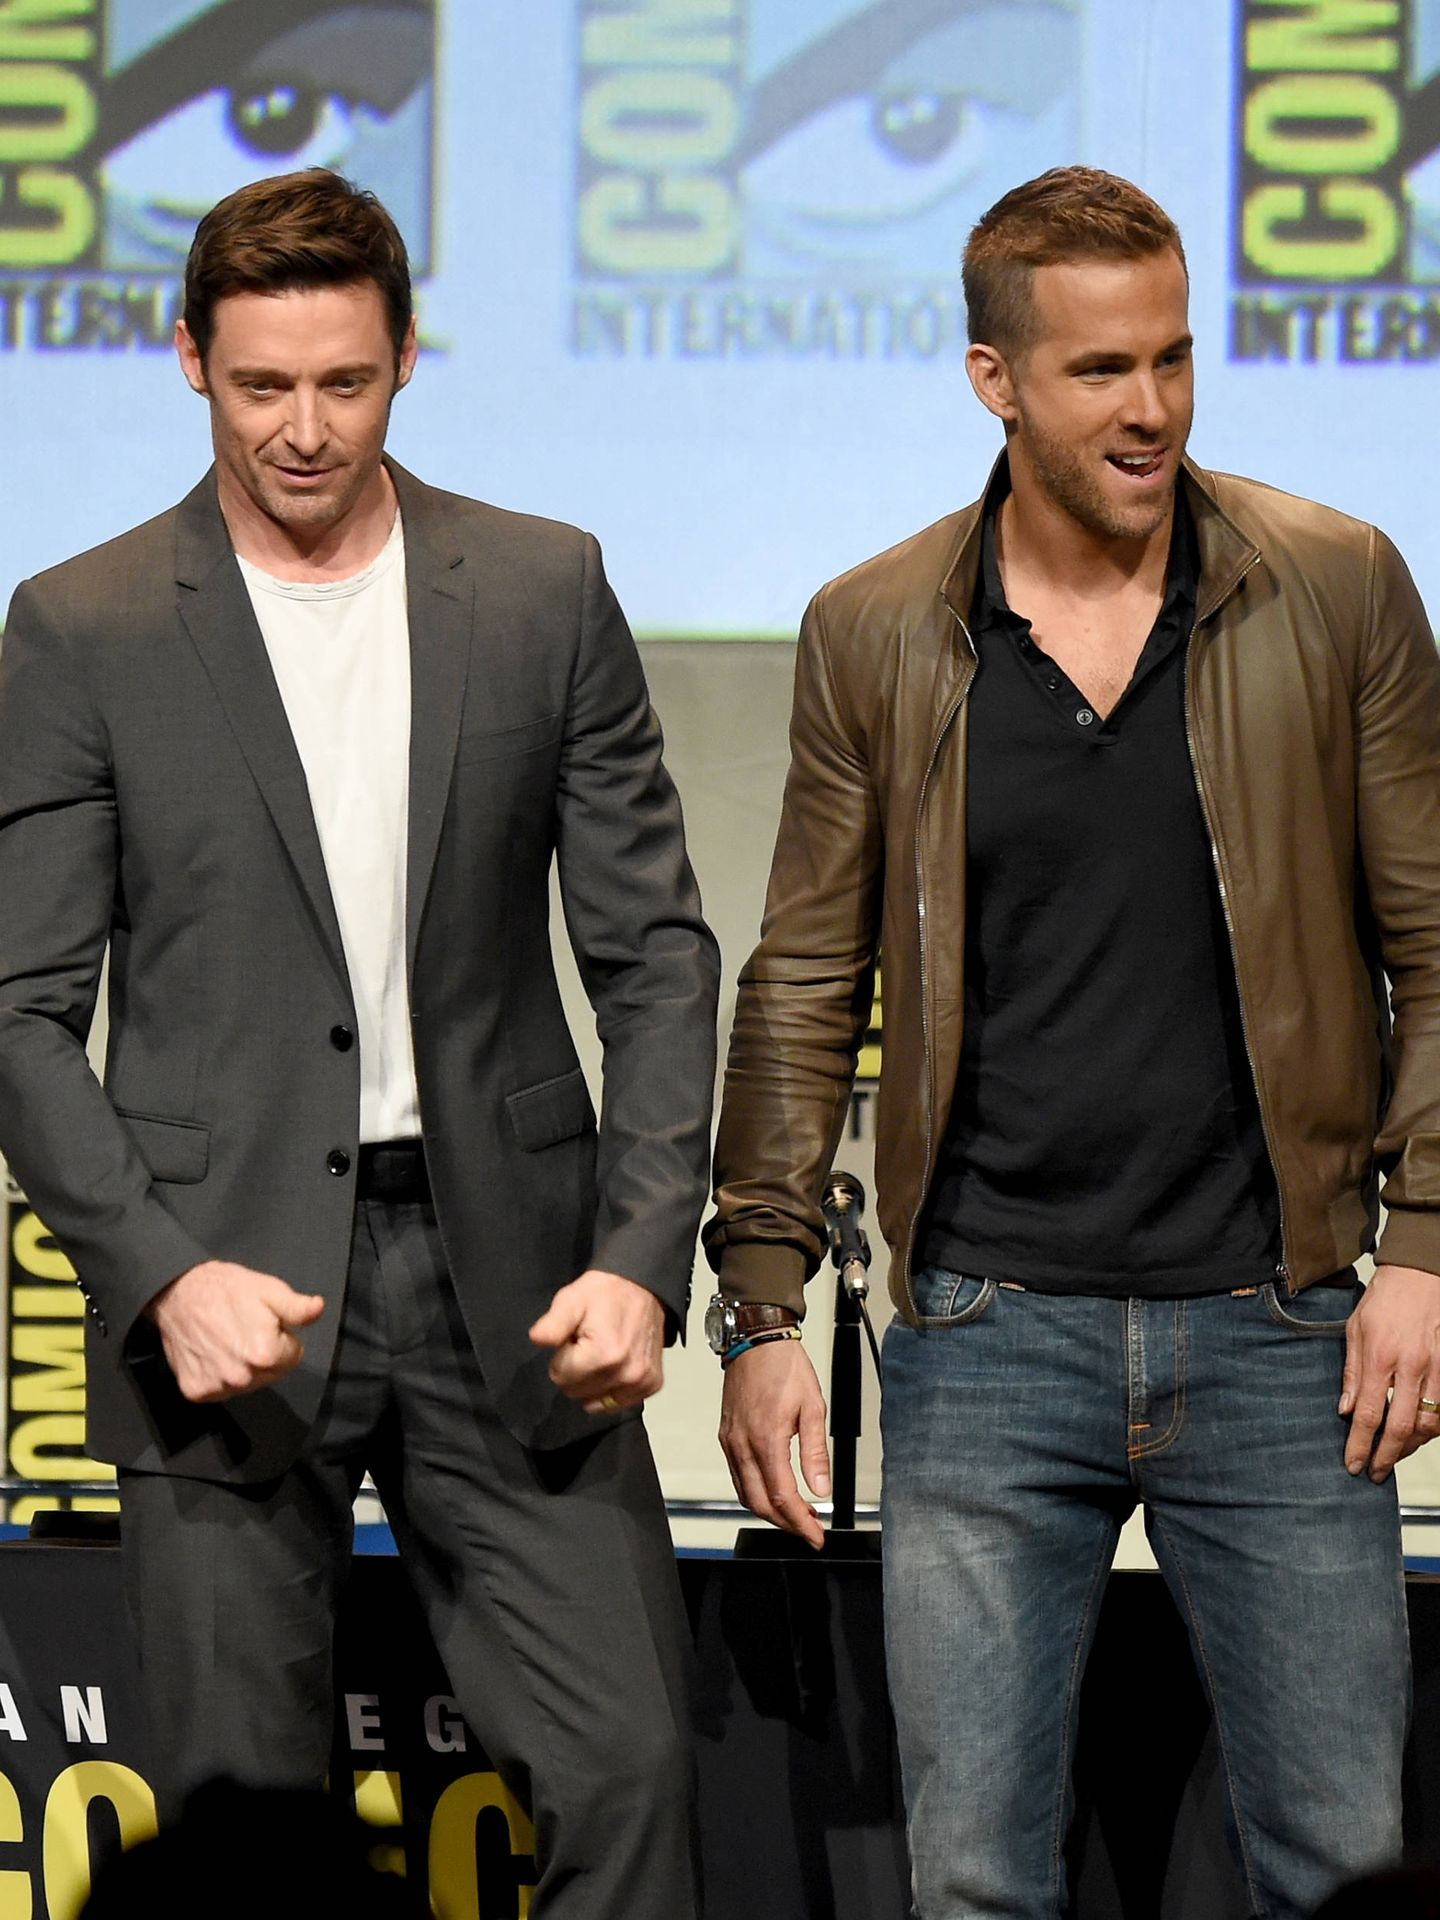 Hugh y Ryan, reyes del 'bromance'. (Getty)